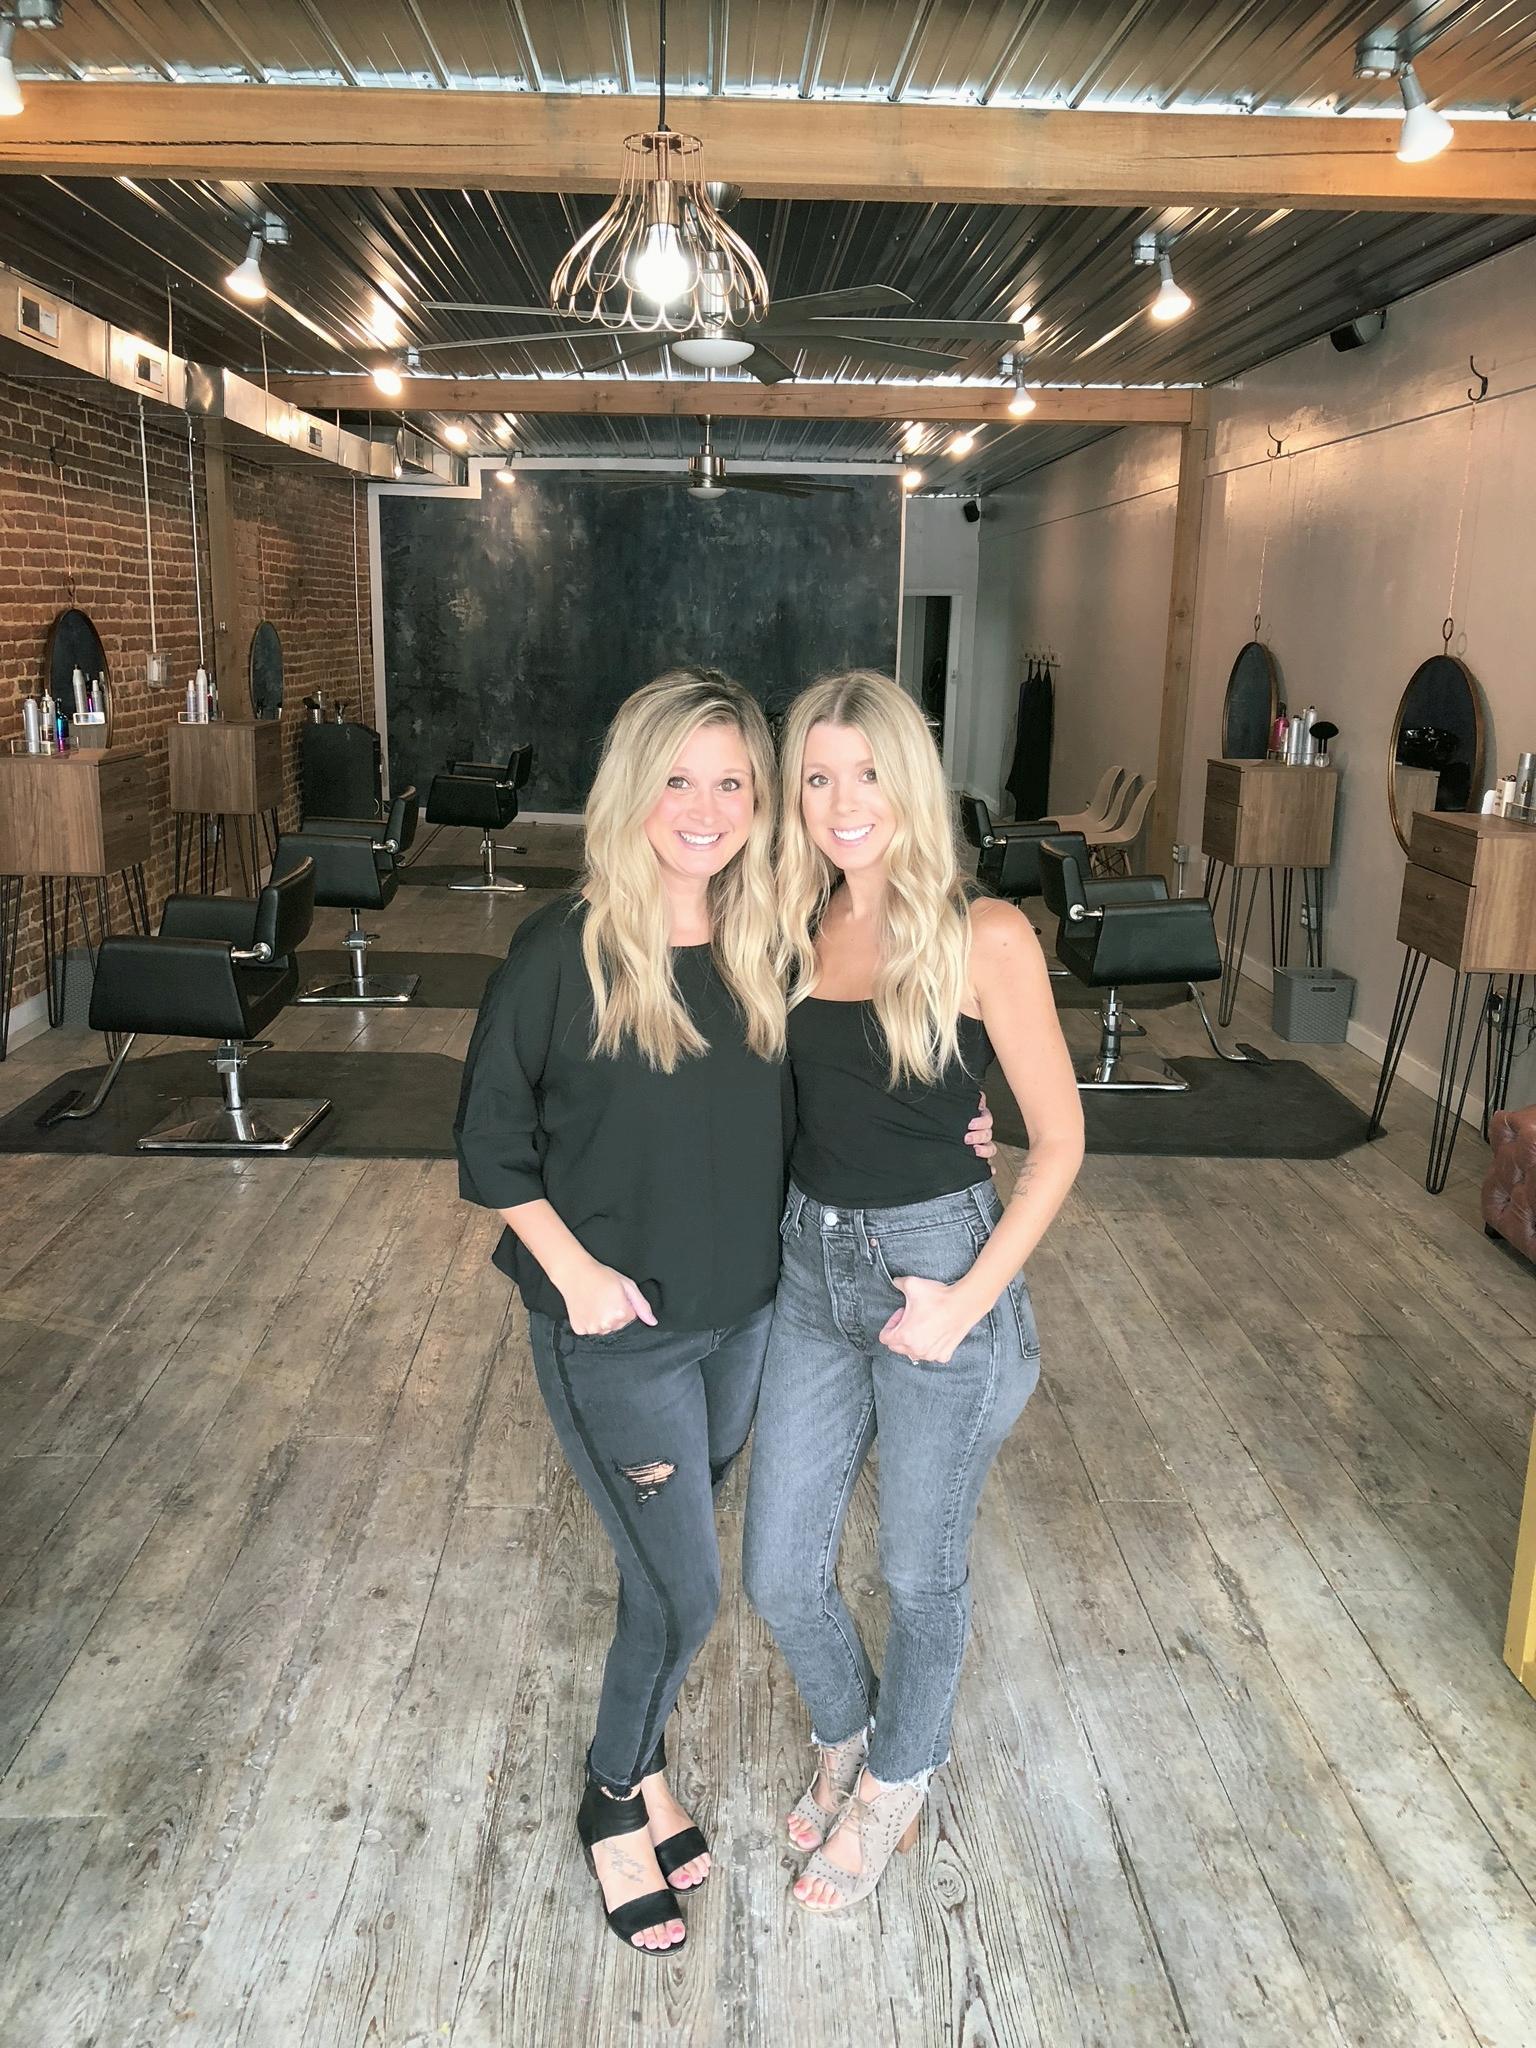 Kayla & Falonn, co-owners Revolve Hair Studios